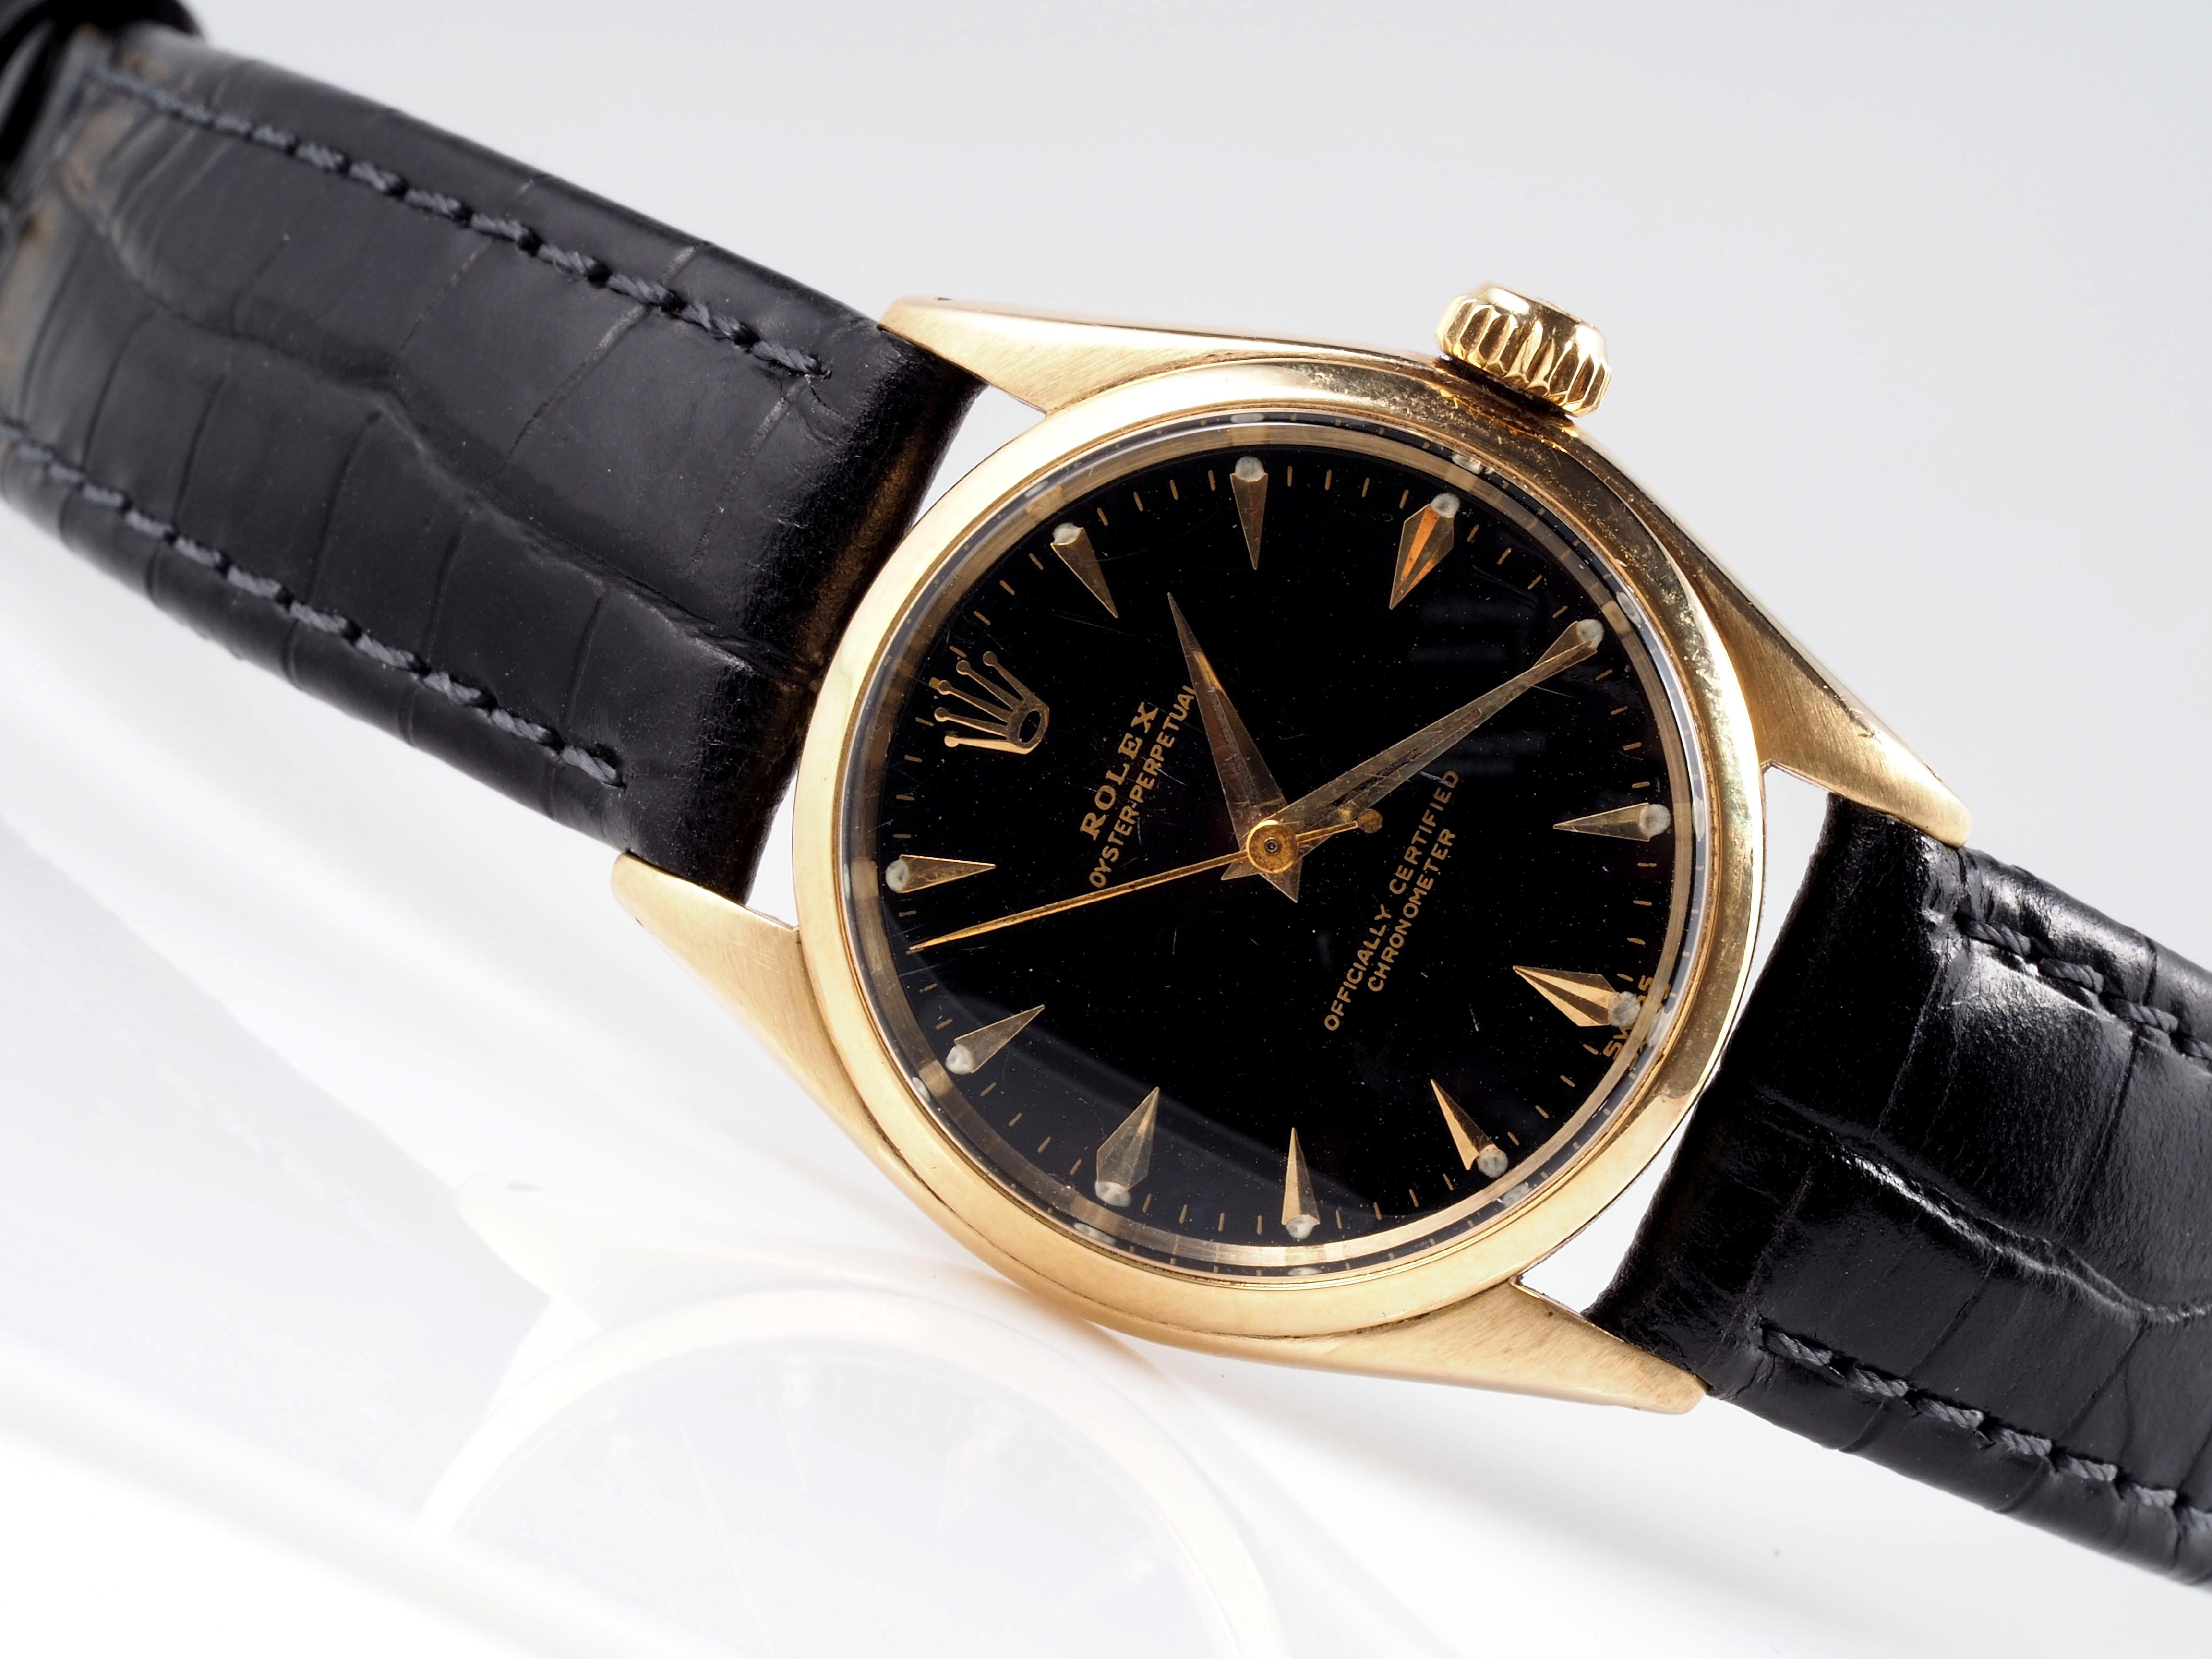 Omega Herrenuhr Gold 585